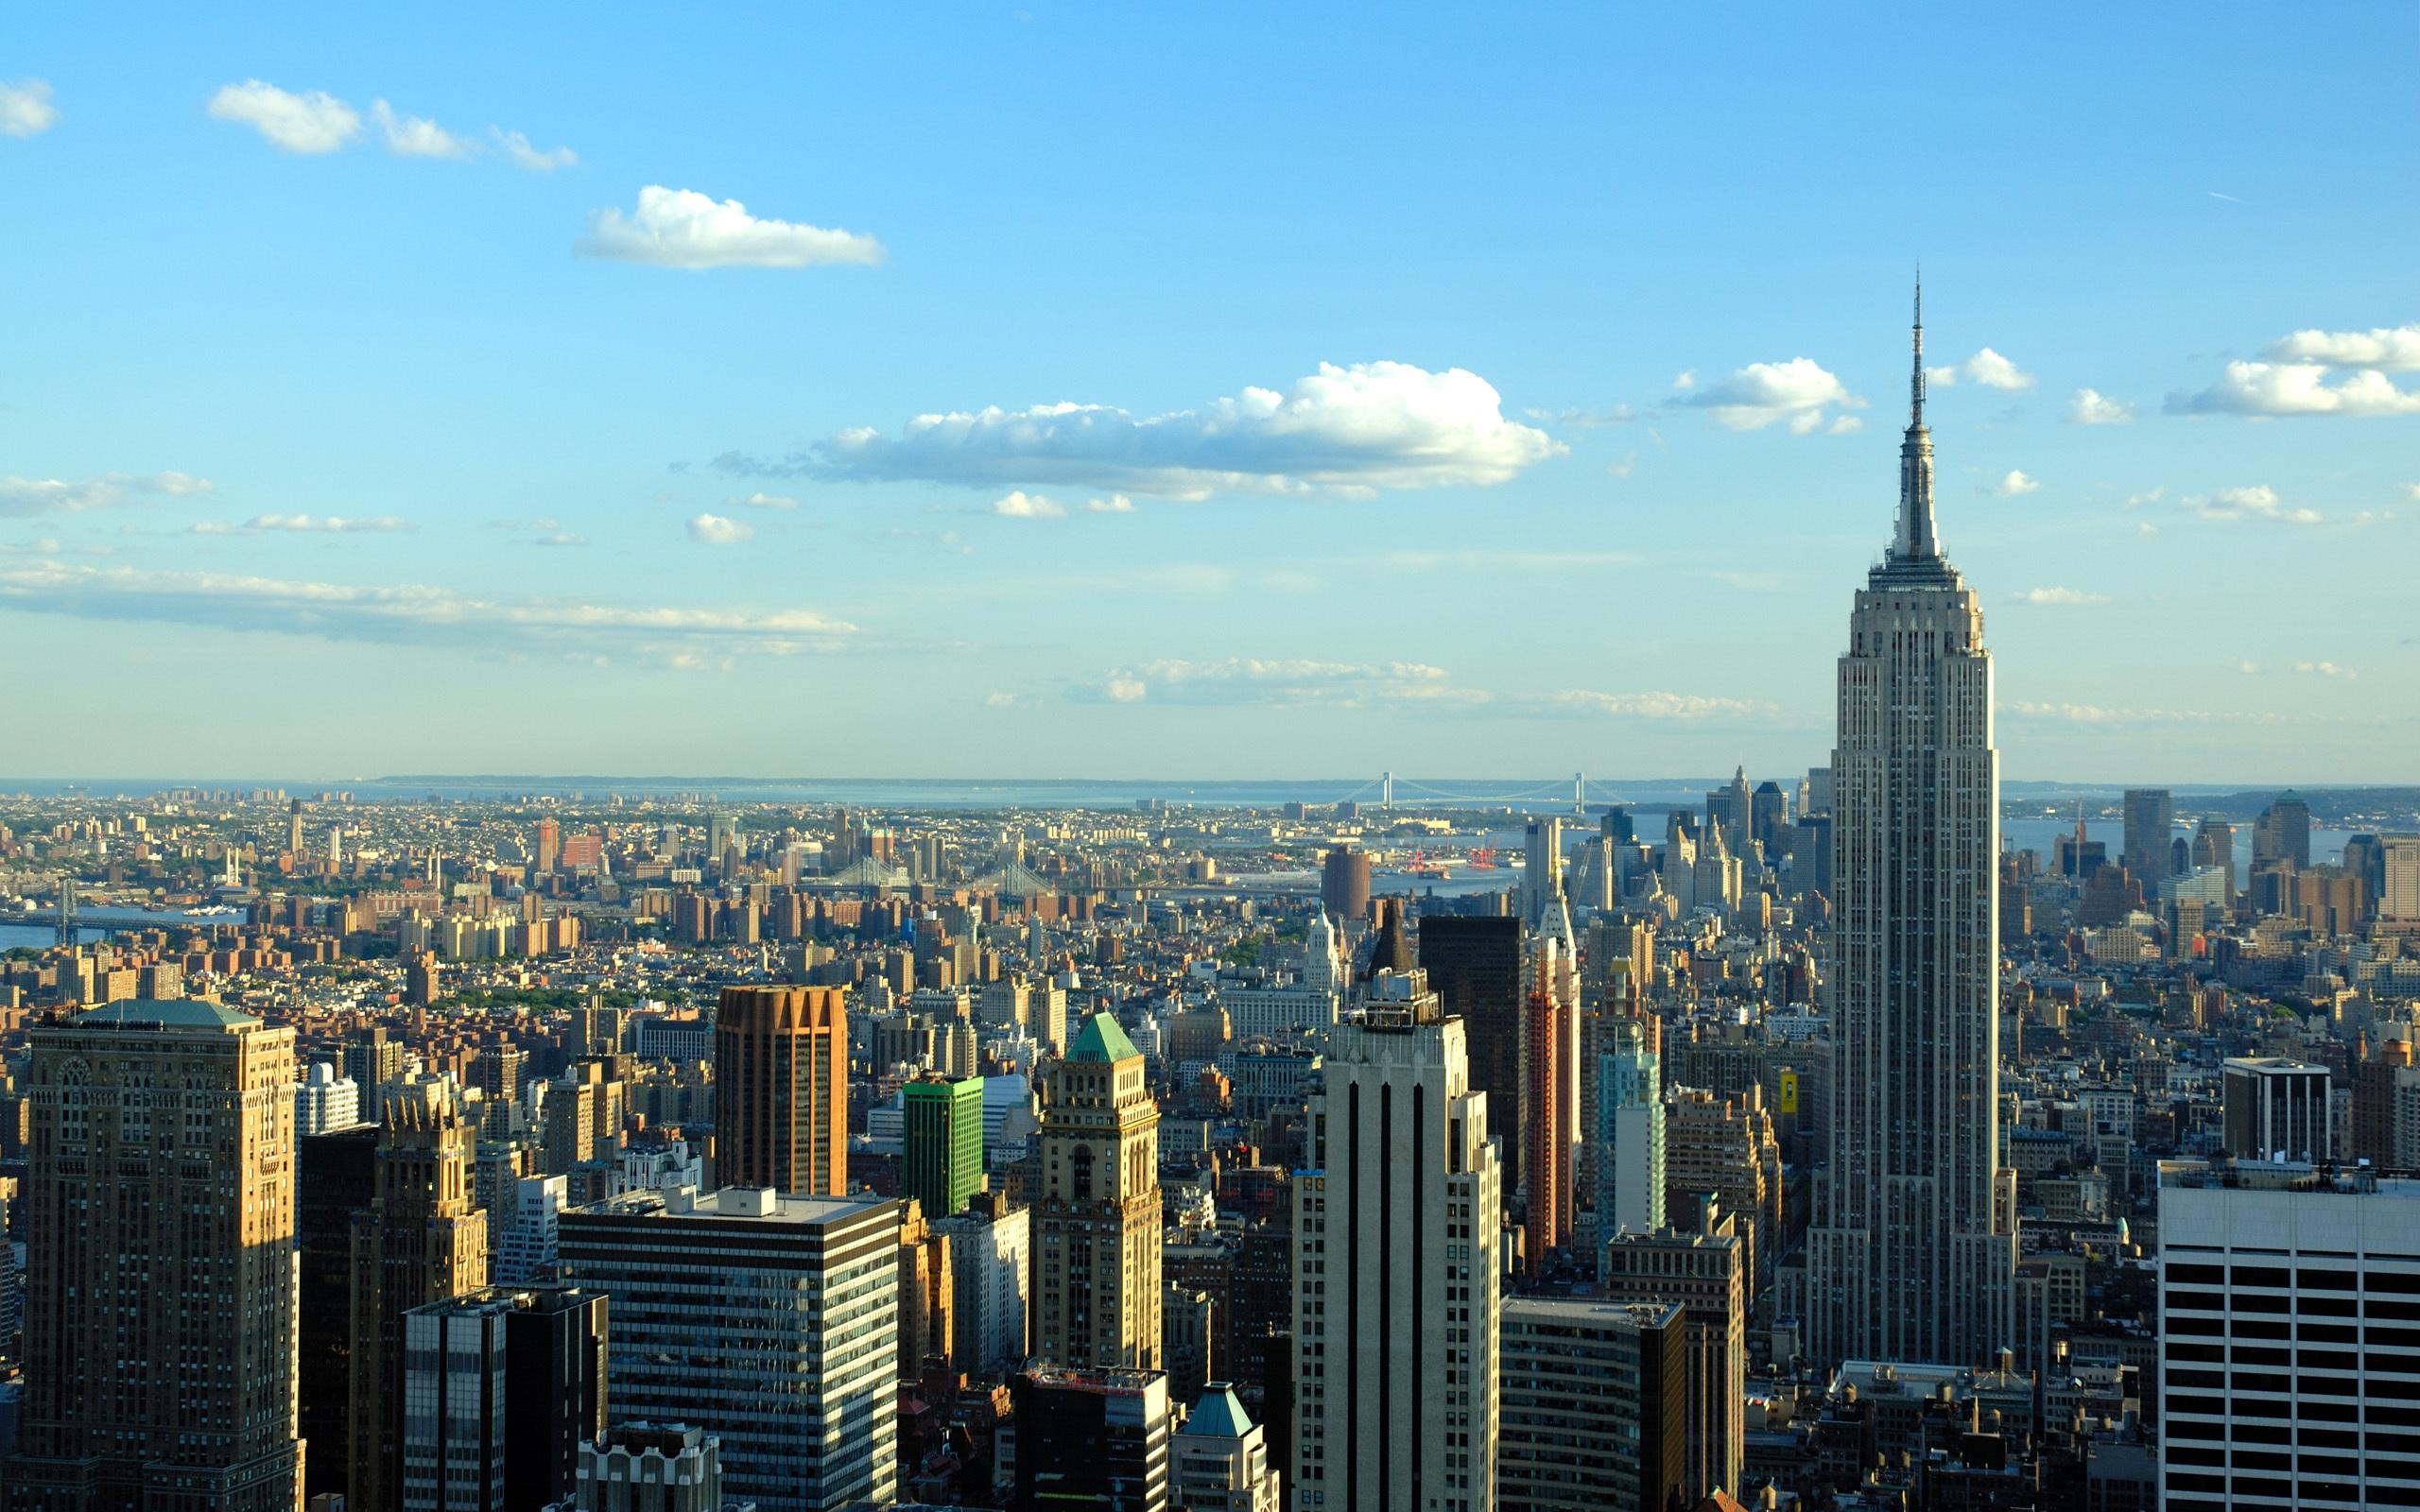 New york skyline wallpaper wallpapersafari for Immagini desktop new york